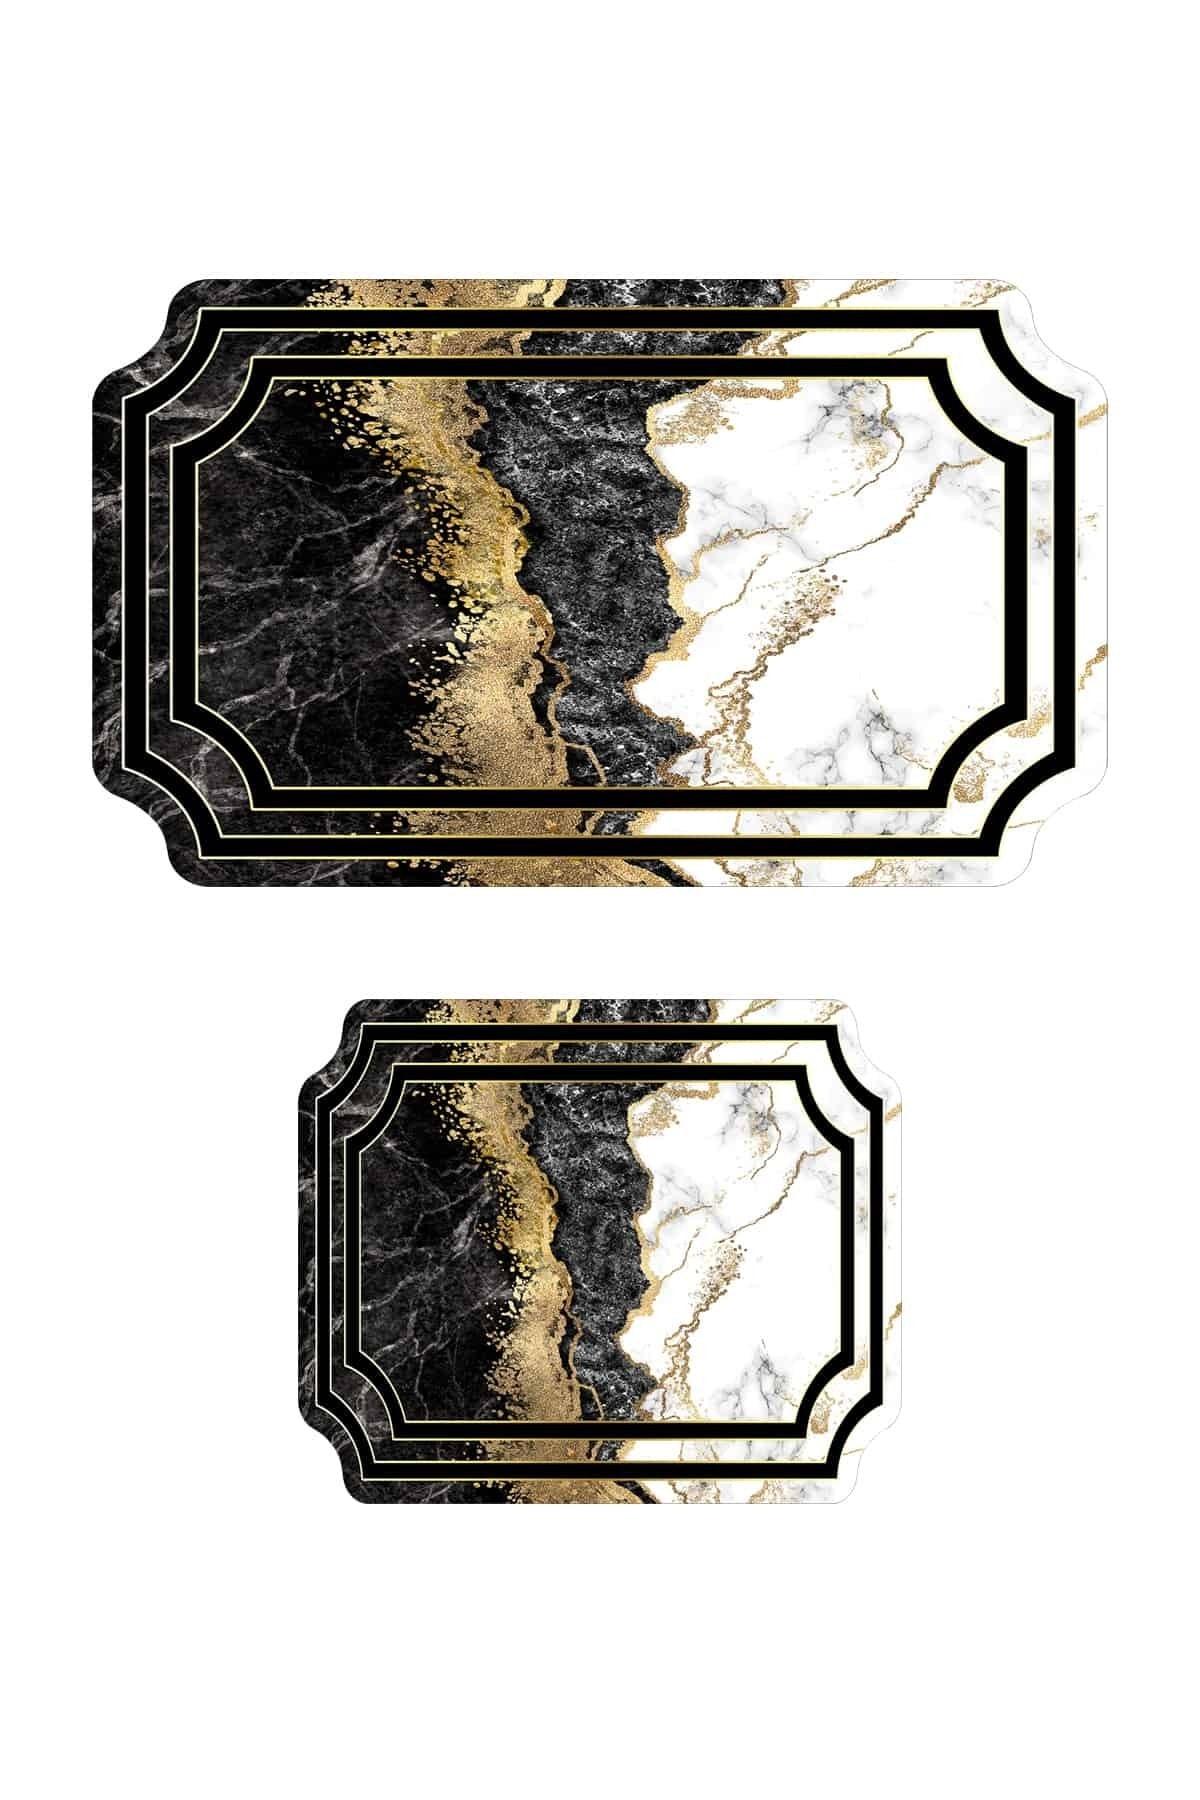 colizon 60x90 - 50x60 Prestij Dijital Banyo Halısı Lazer Kesim Klozet Takımı 2'li Paspas Seti 2